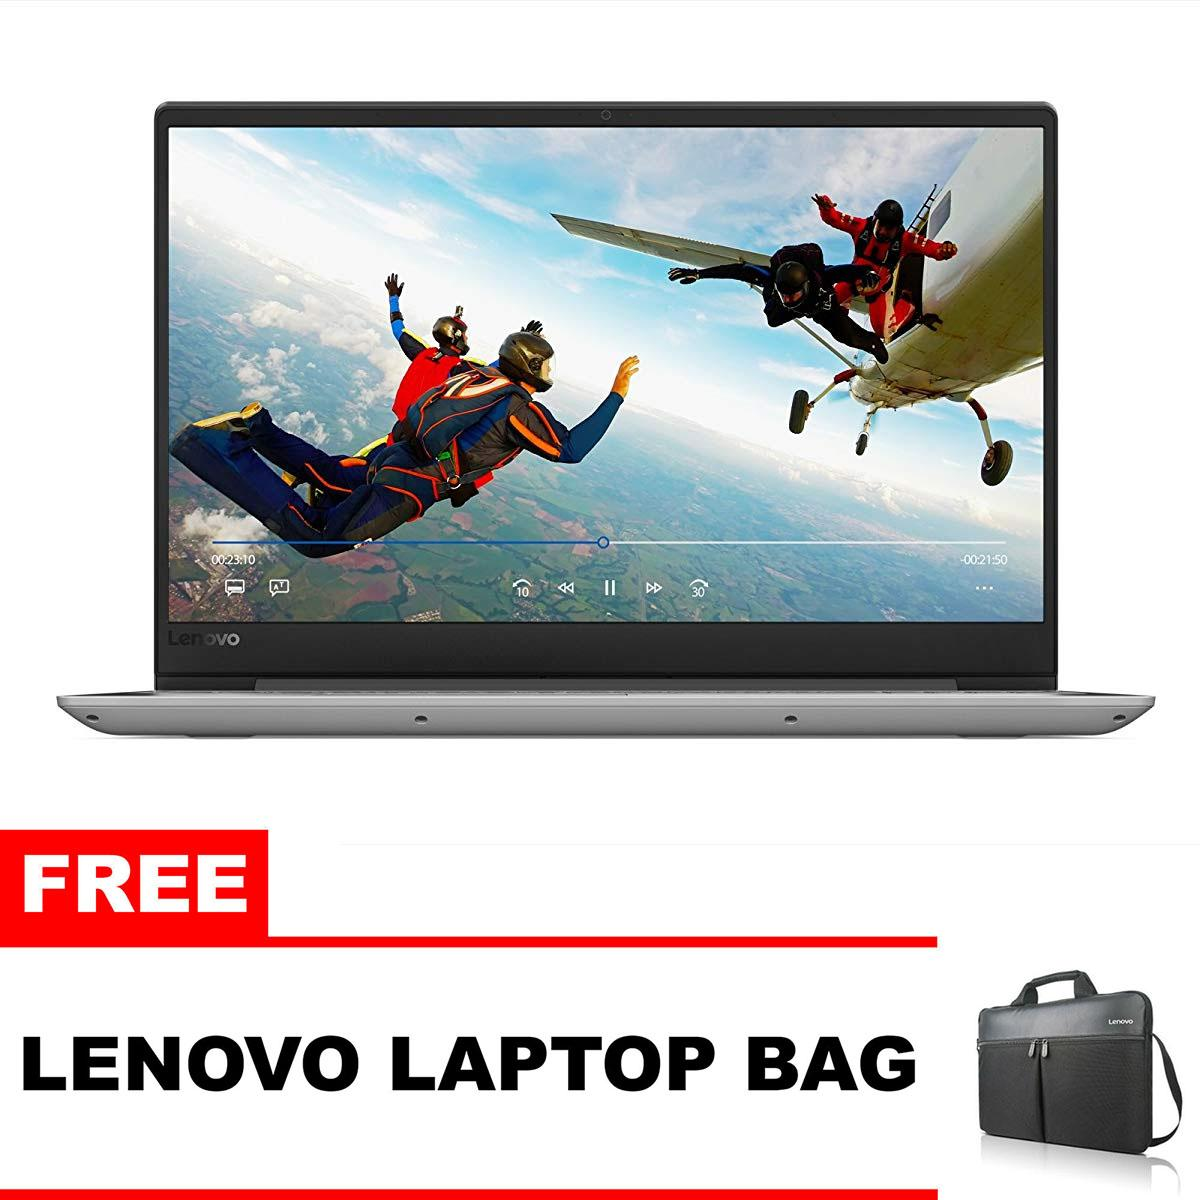 Laptops Philippines Lenovo Yoga 330 N4000 4gb 128gb 116 Hd Win10 Ideapad 14ikbr 81g20044ph 4 In Intel Core I3 7020u